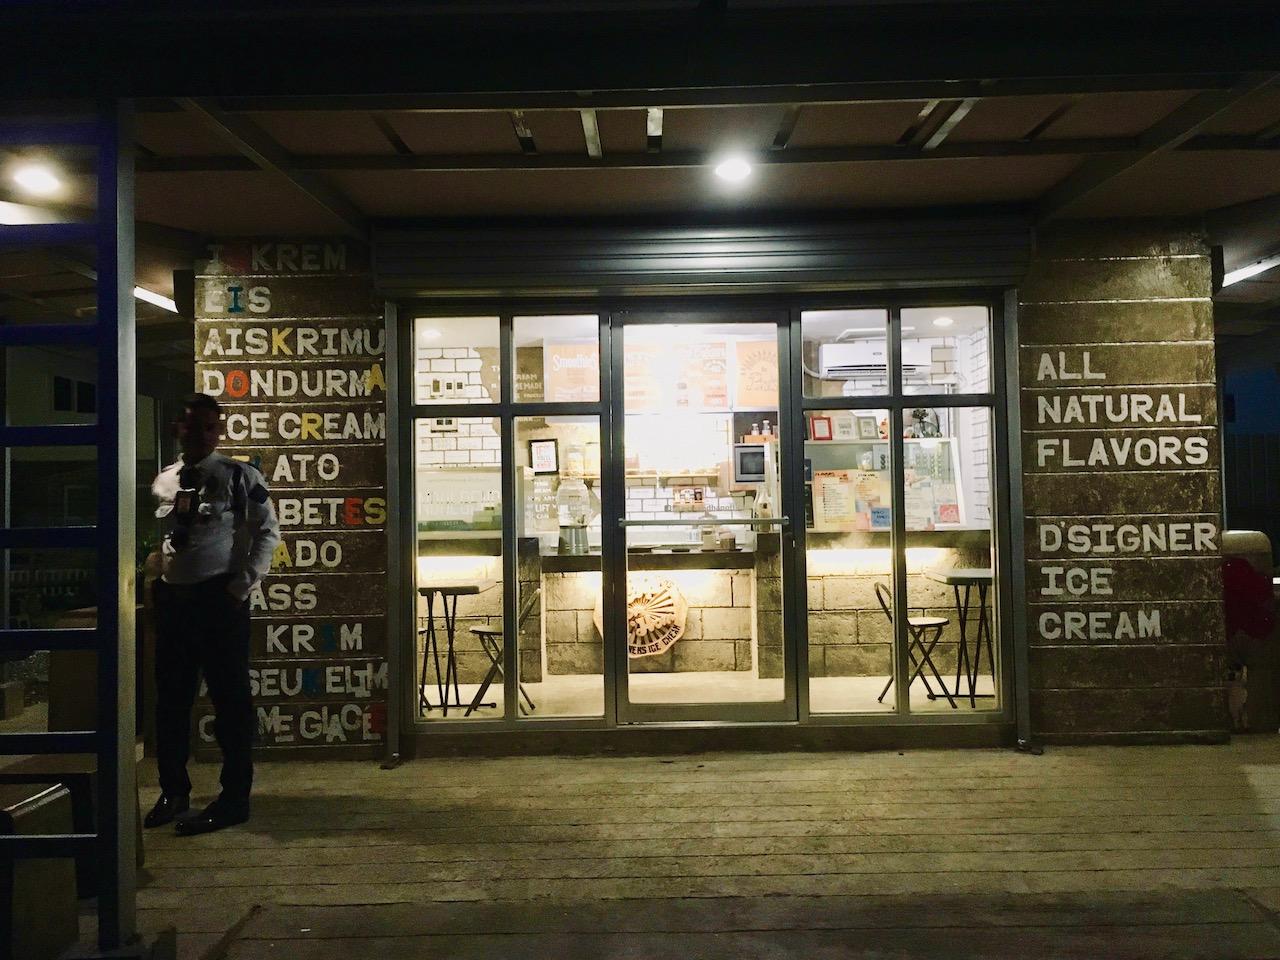 Aysken D' Hanの店外